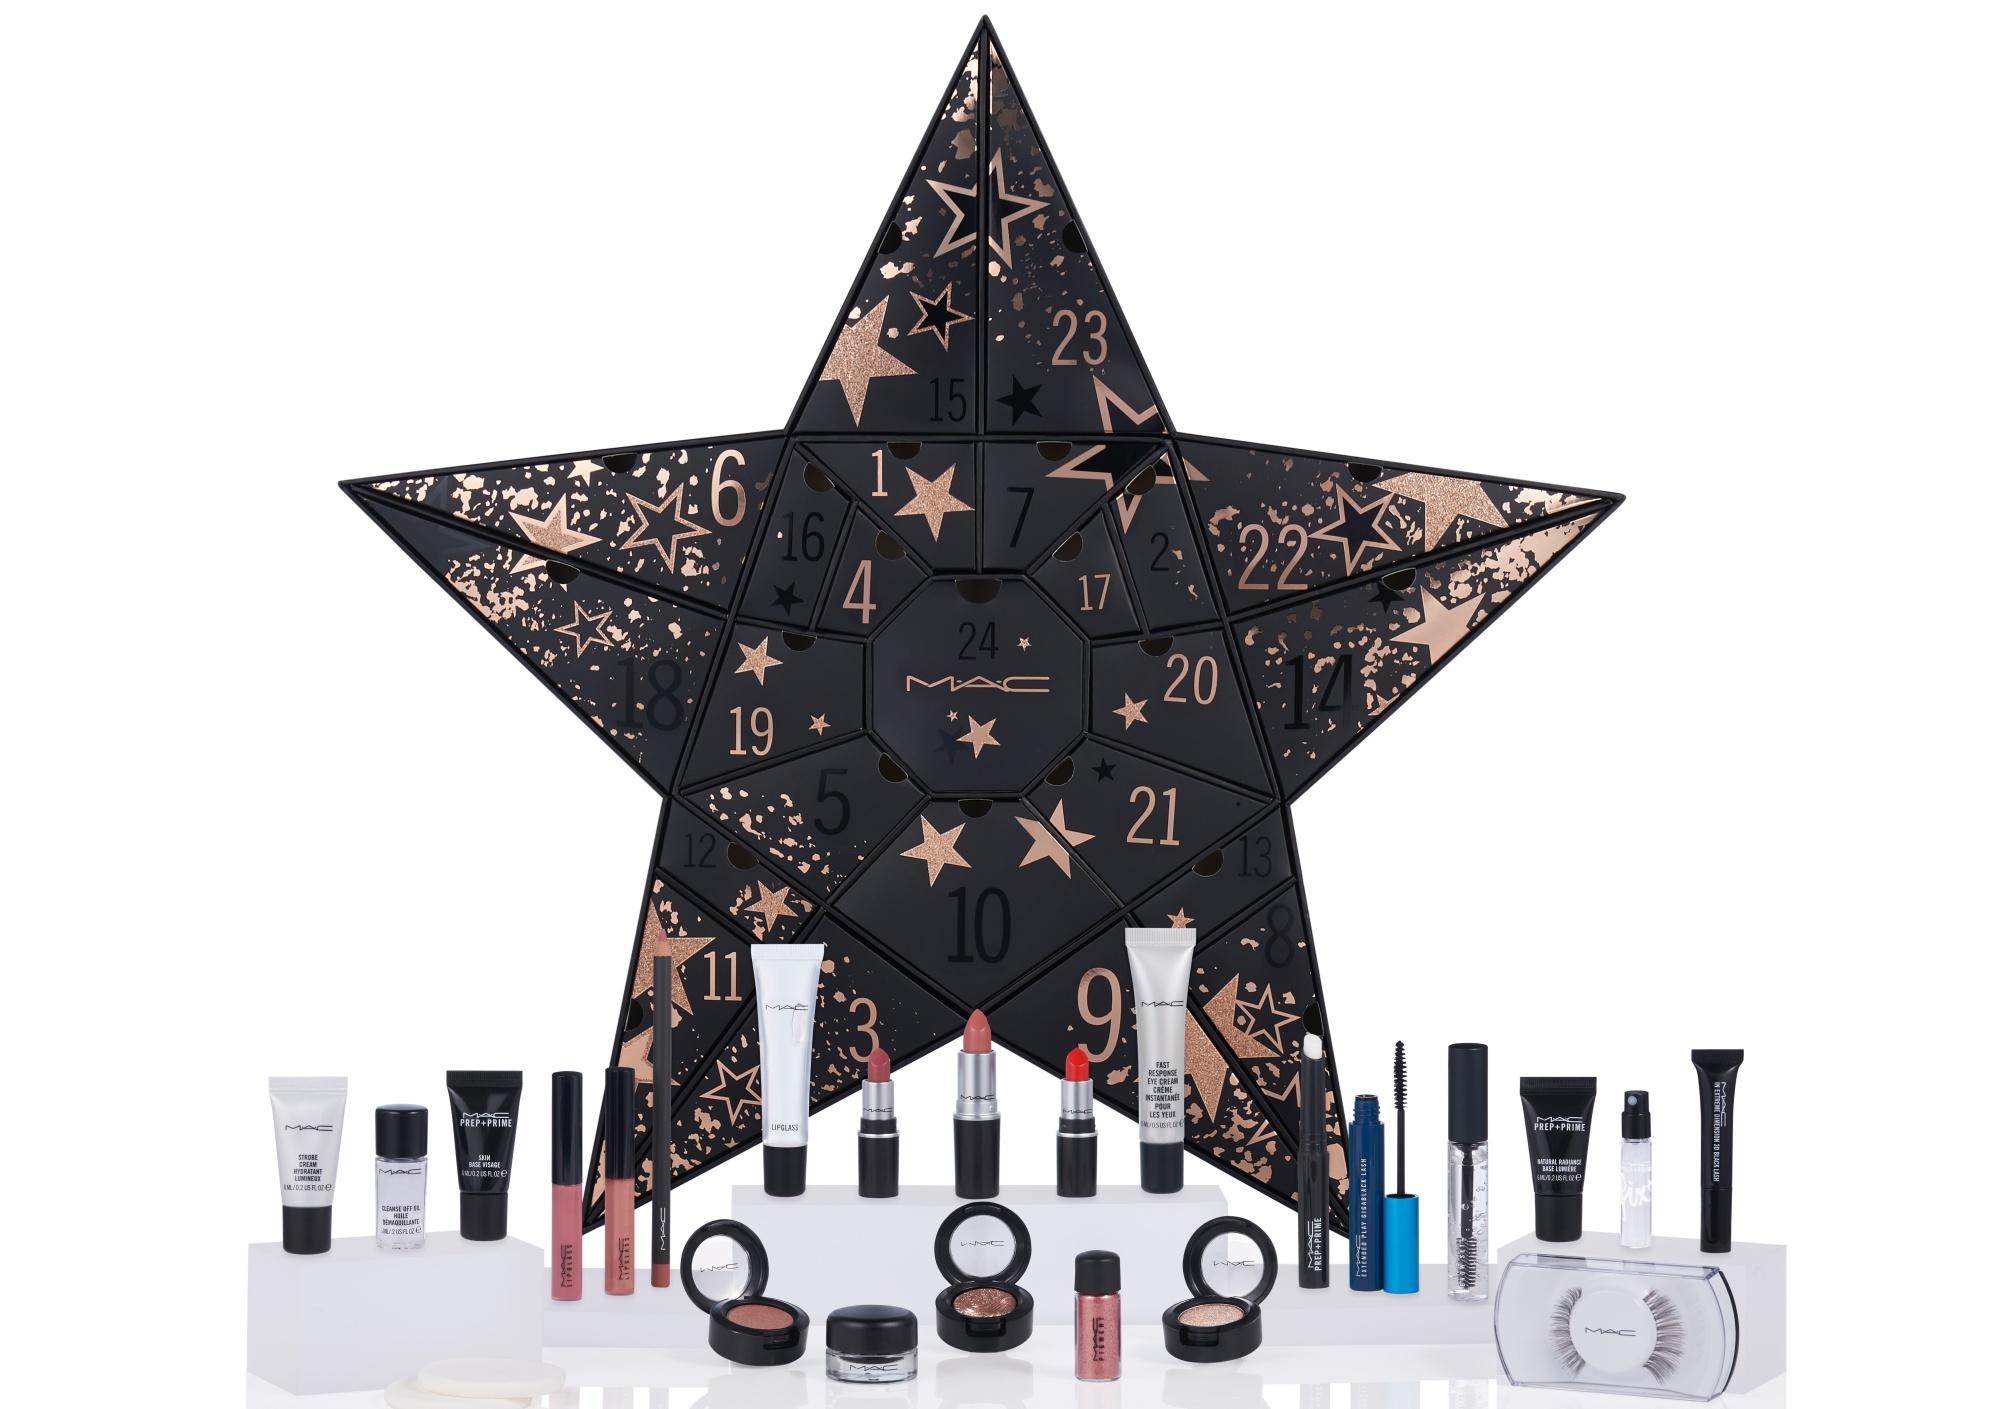 MAC Cosmetics Advent Calendar 2019 - The LDN Diaries